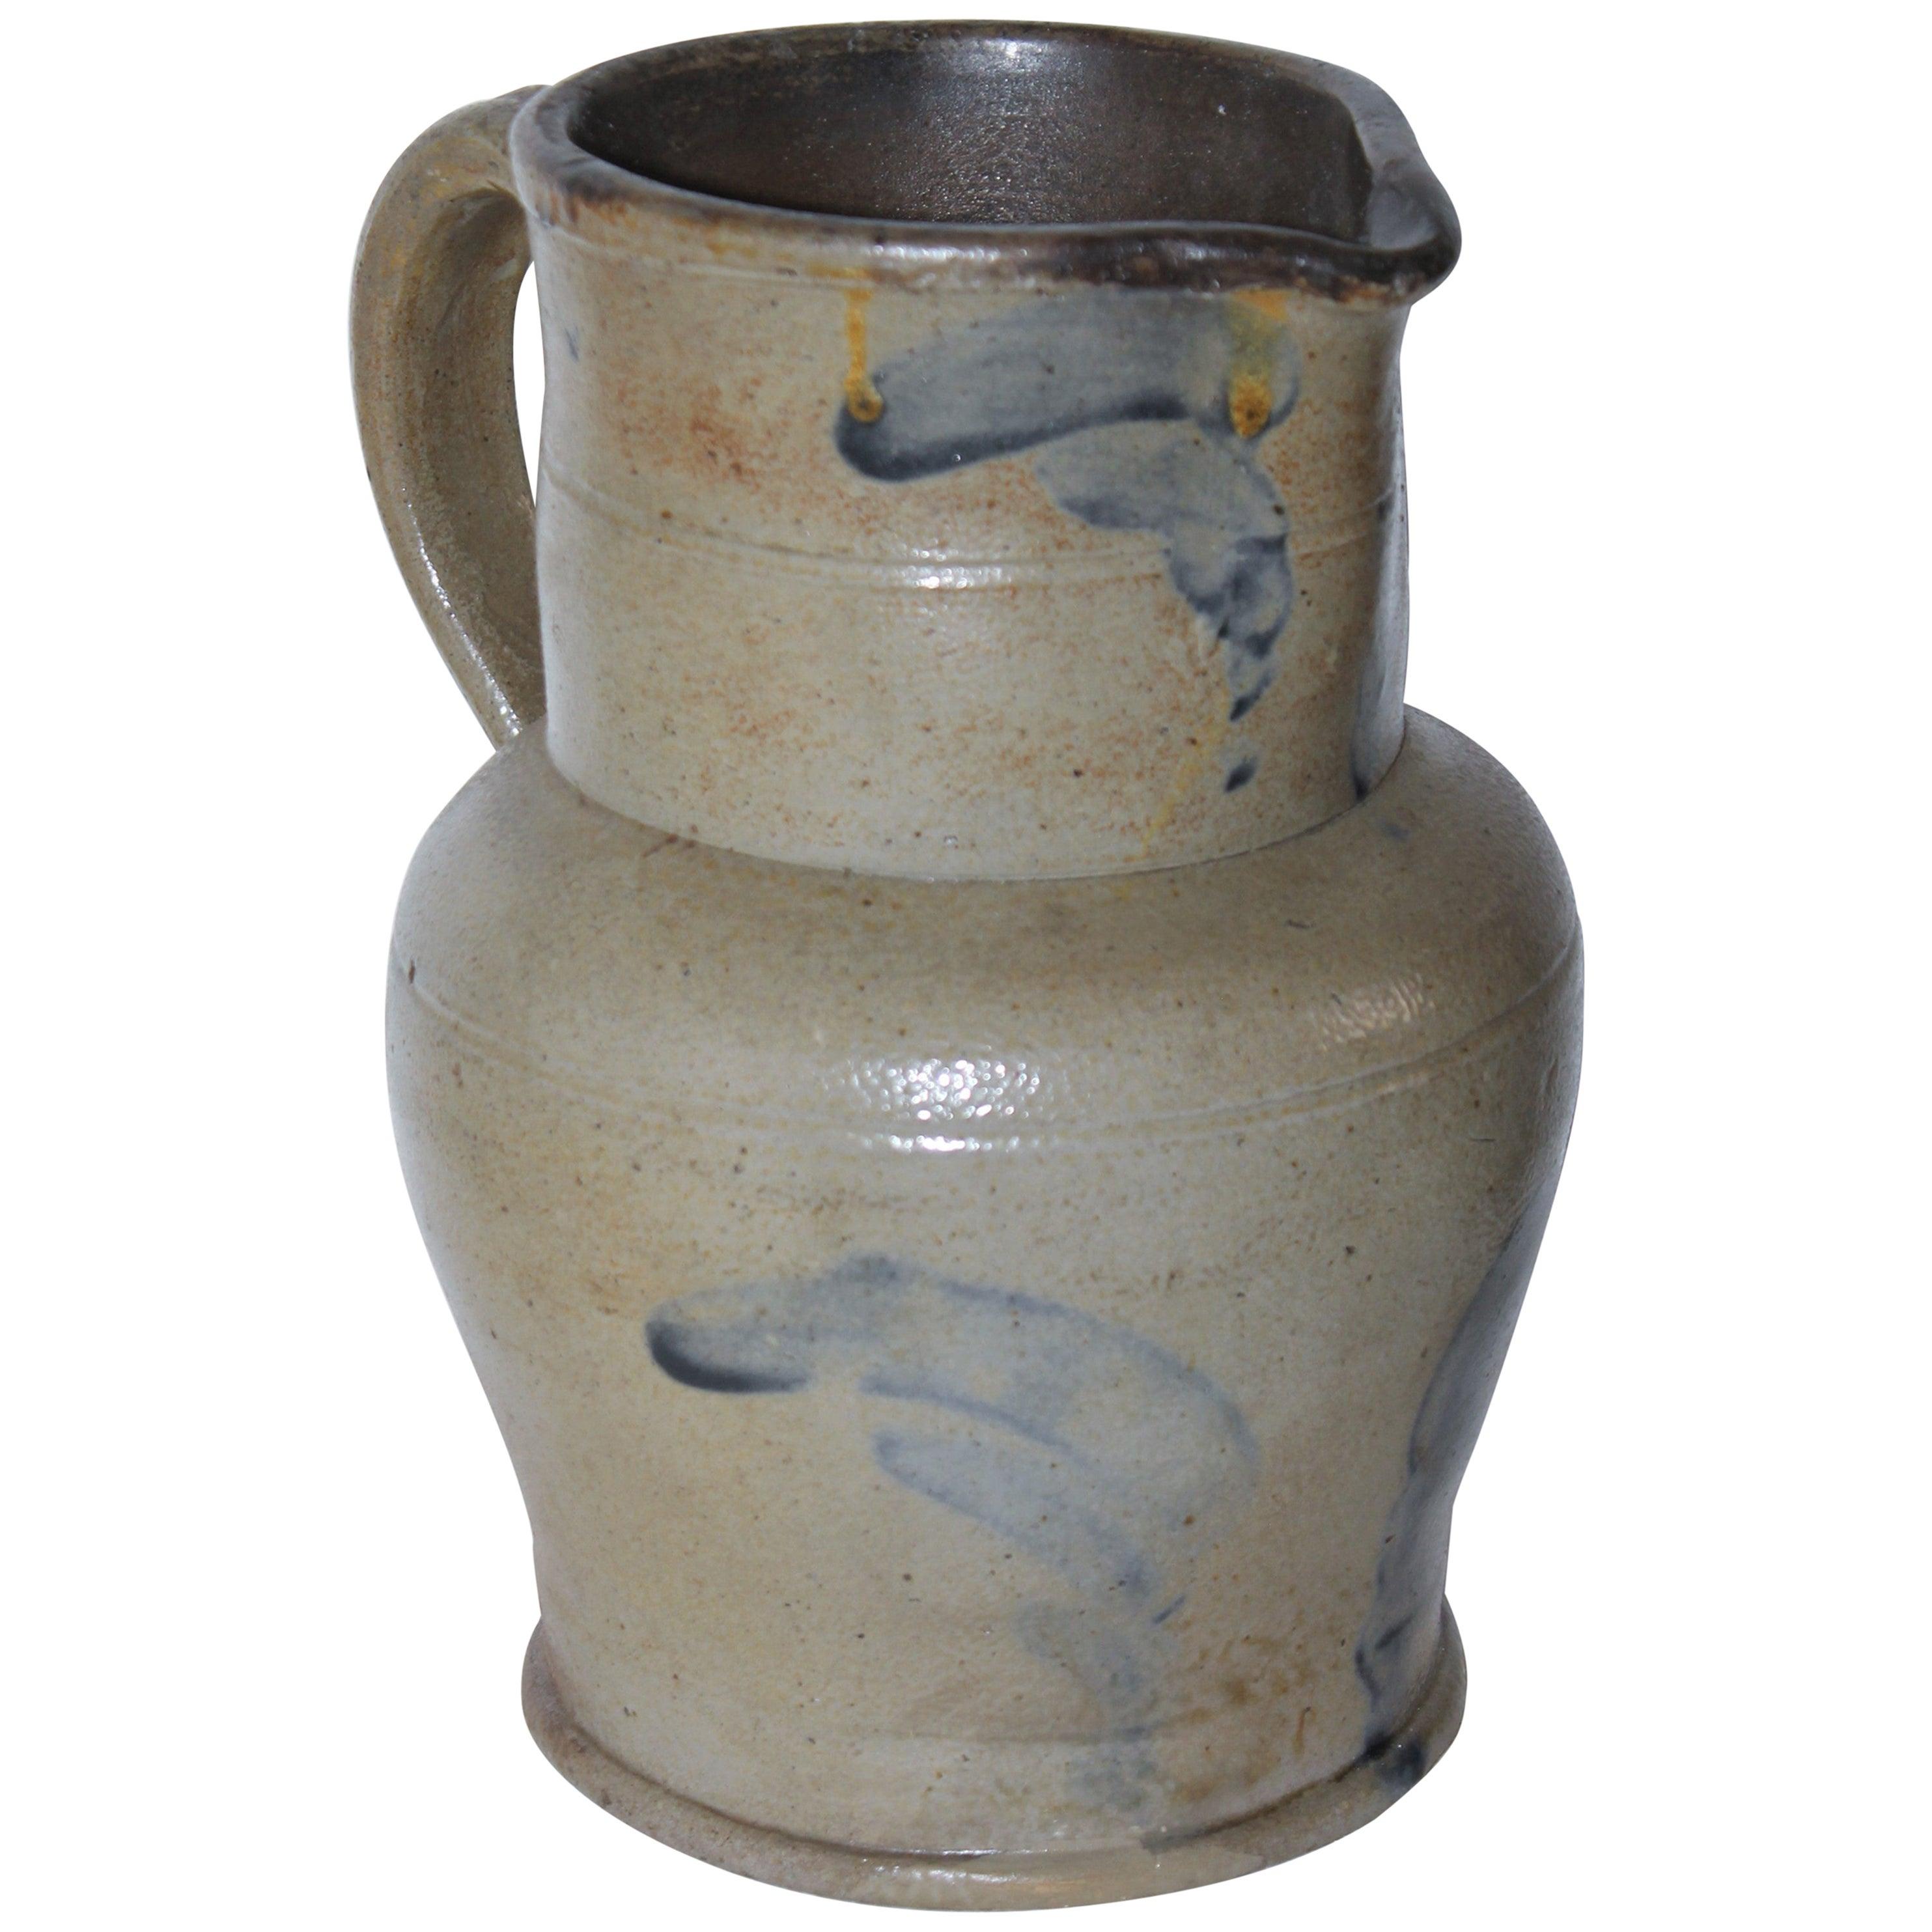 19thc Rare Small Decorated Stoneware Pitcher